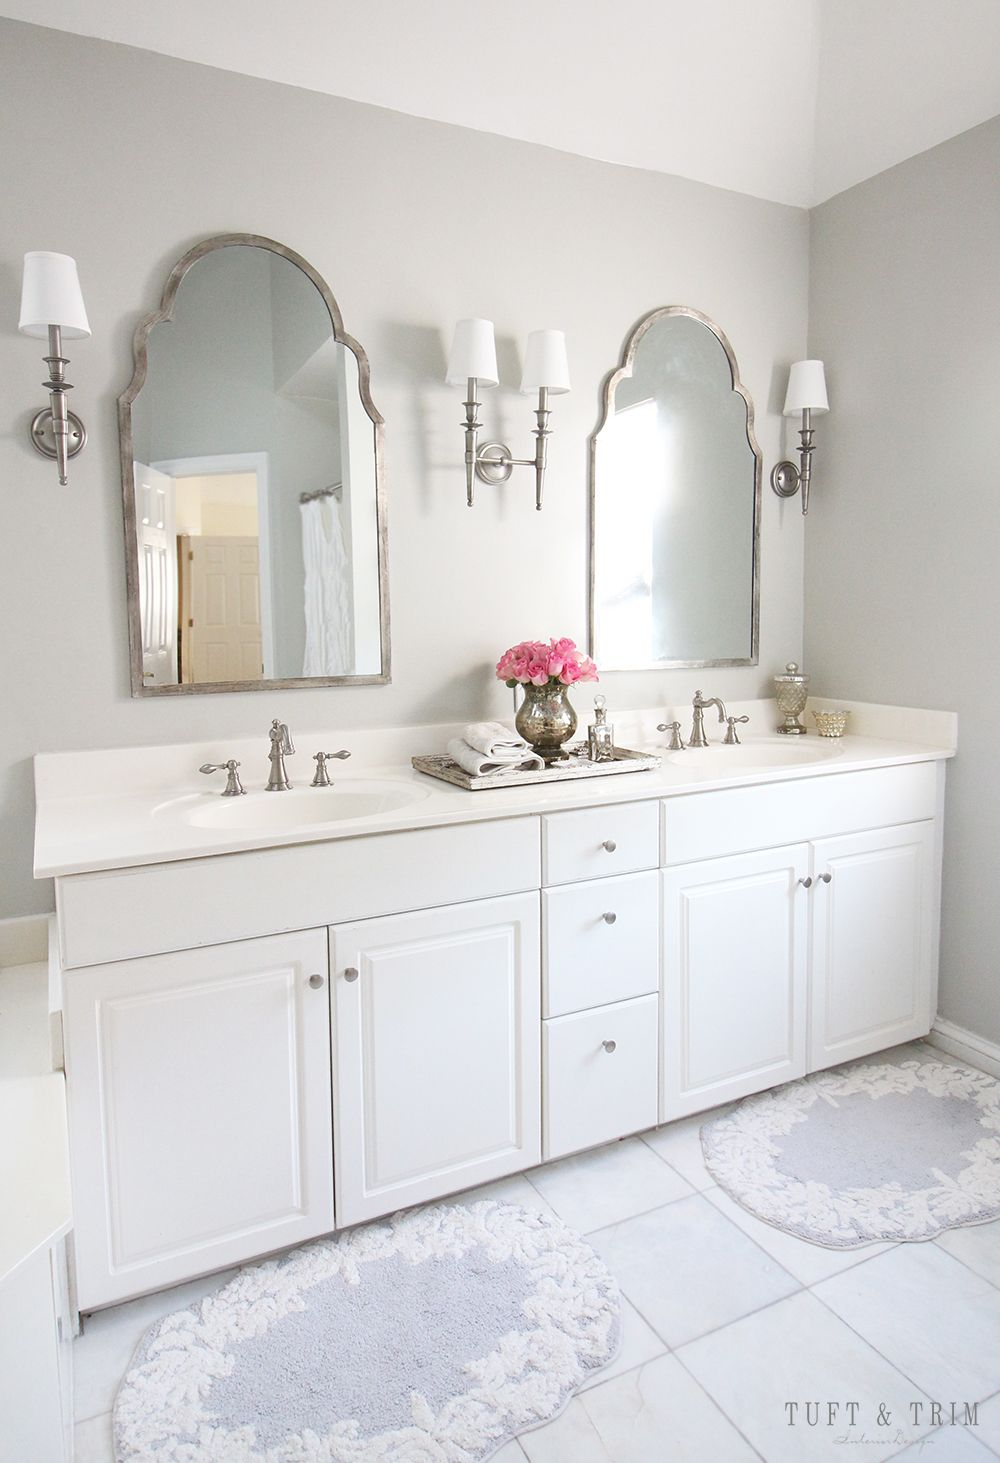 Master Bathroom Diy Before And After Budget Bathroom Remodel